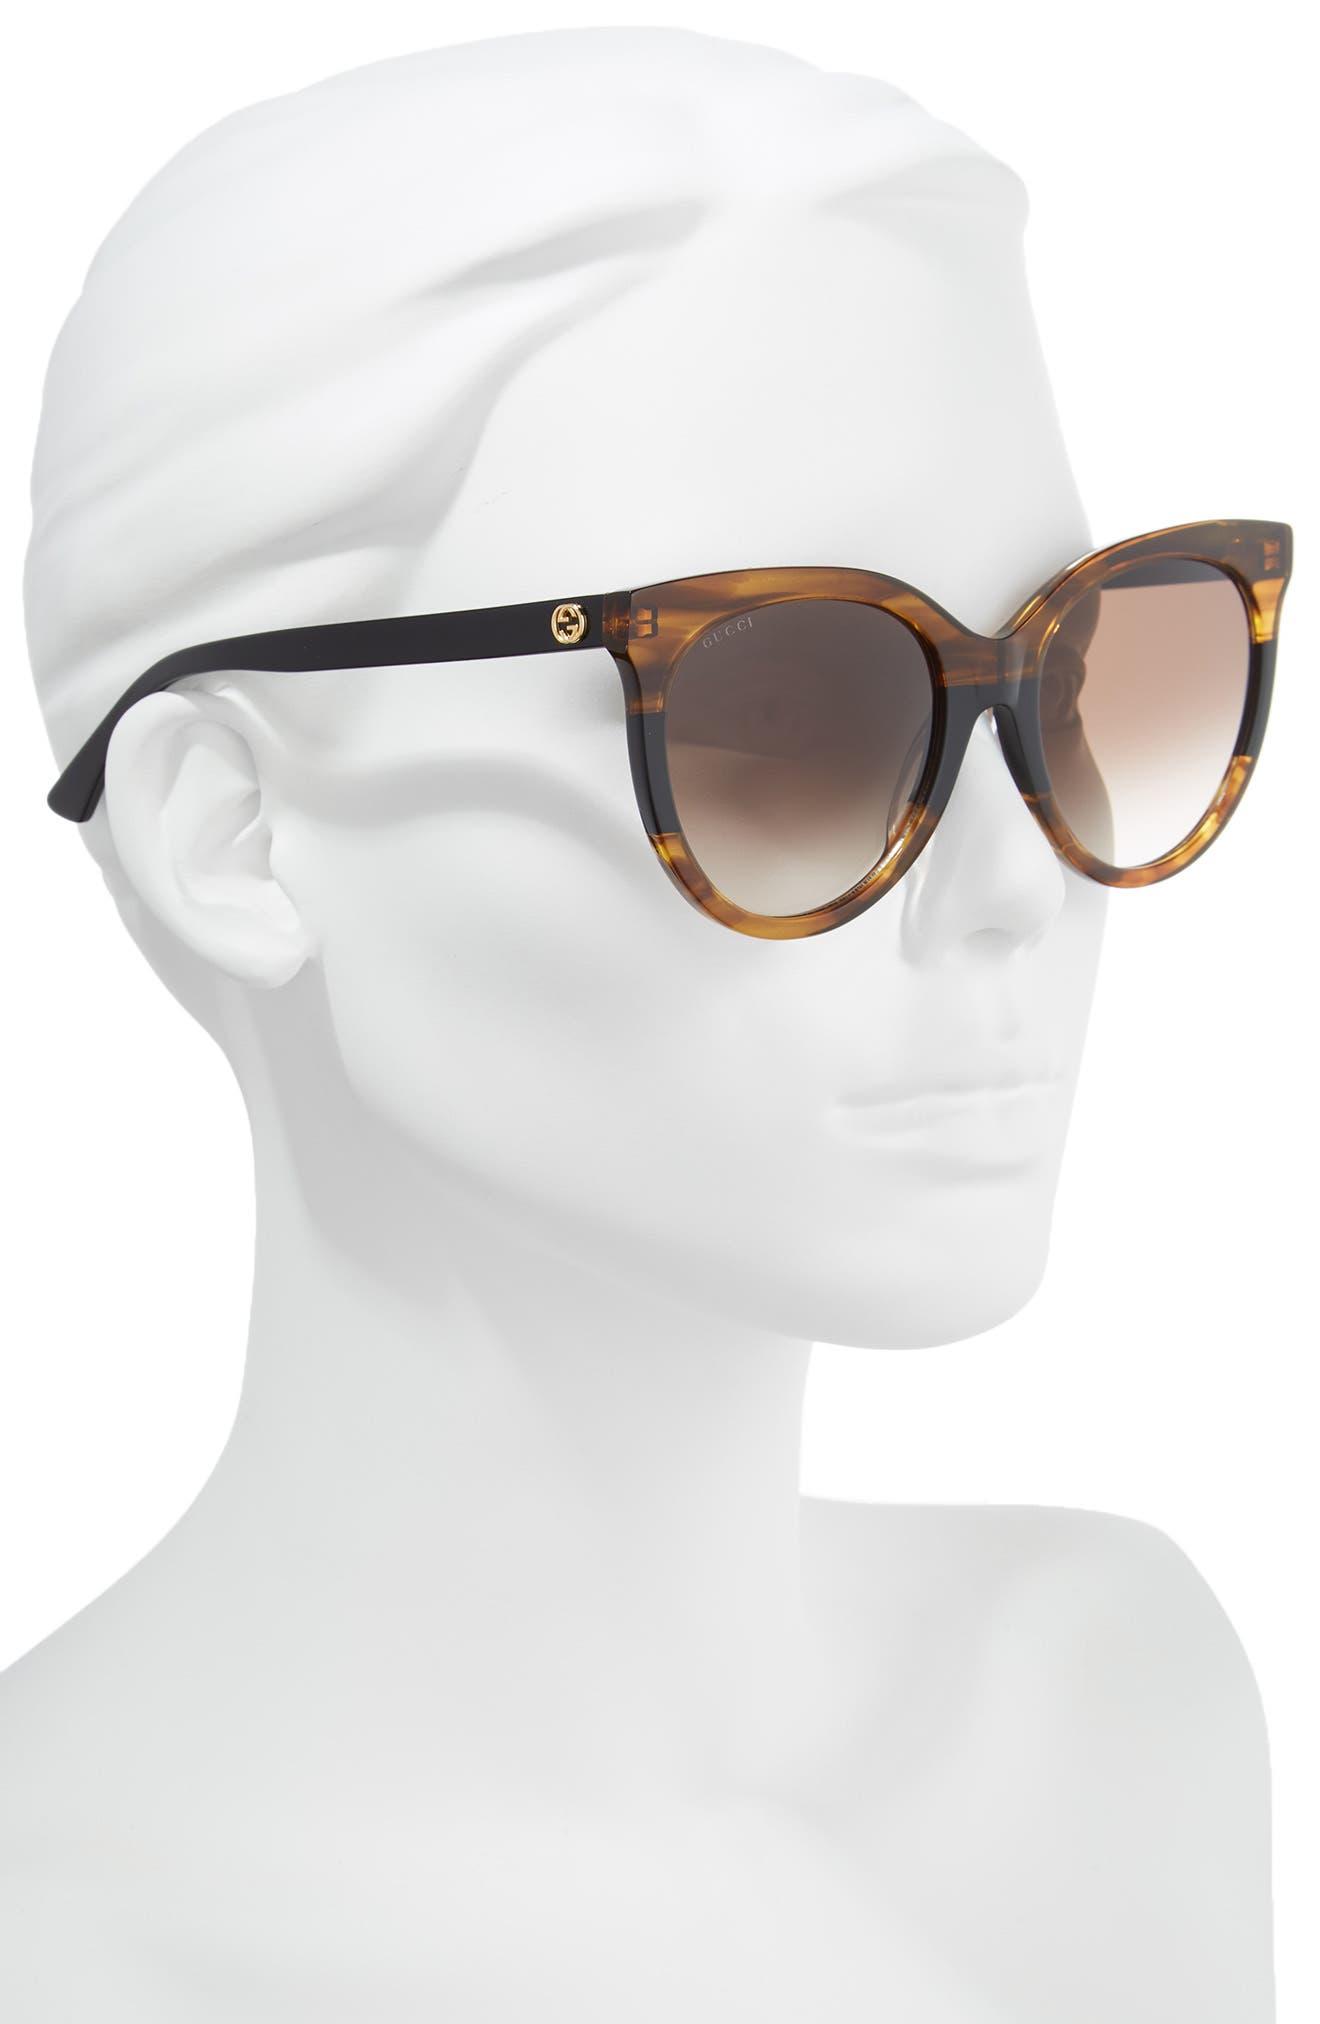 GUCCI,                             55mm Round Sunglasses,                             Alternate thumbnail 2, color,                             213